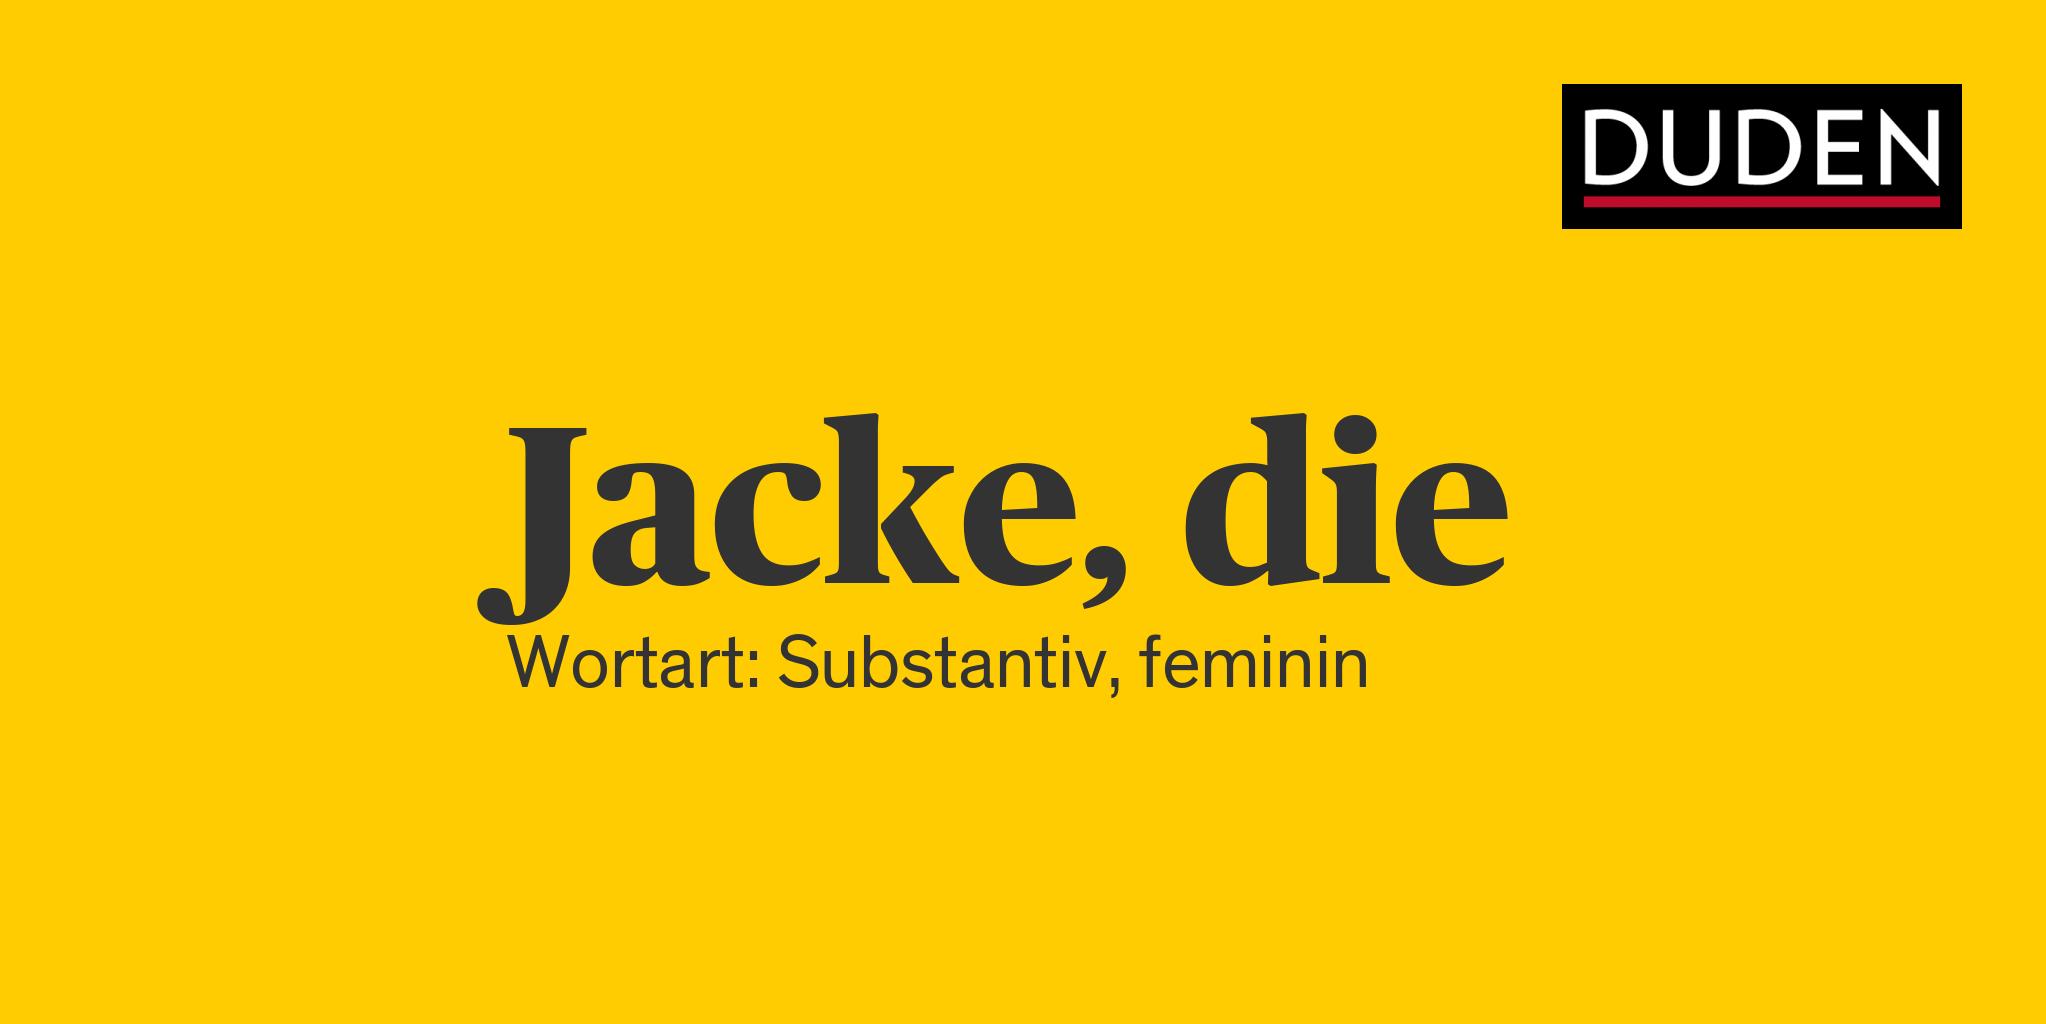 Duden   Jacke   Rechtschreibung, Bedeutung, Definition, Herkunft